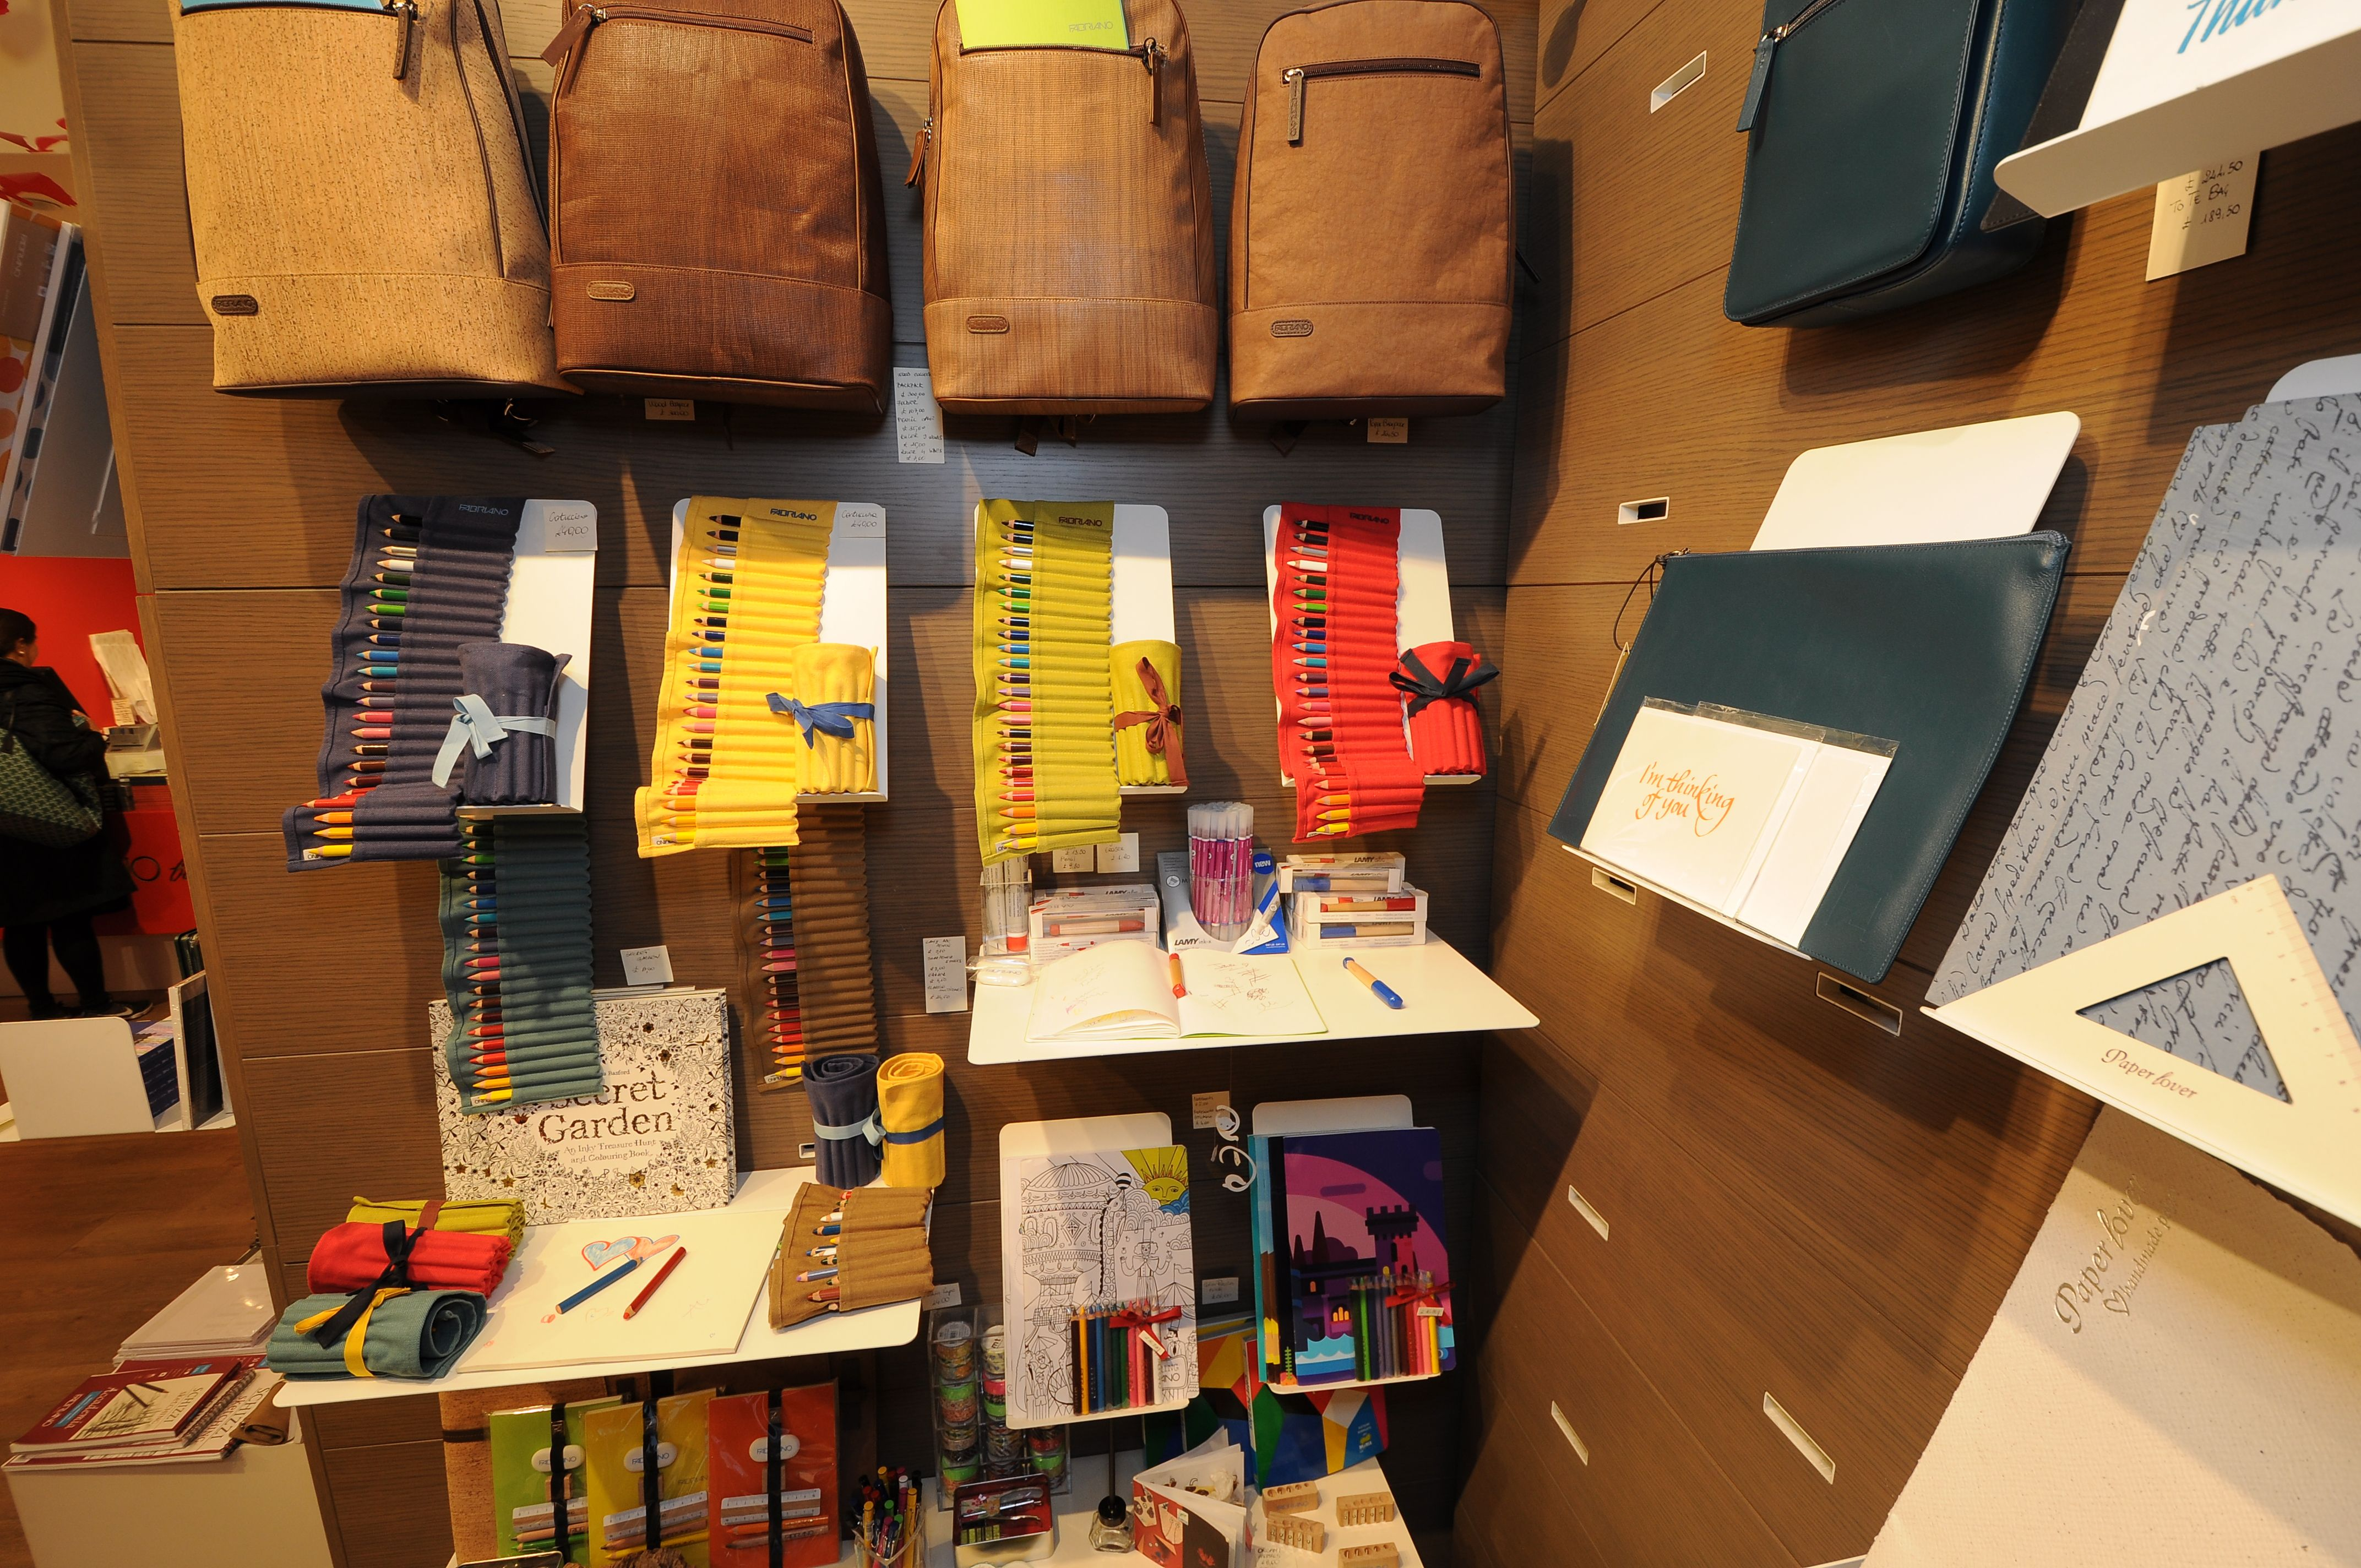 Fabriano Boutique, Marylebone, London